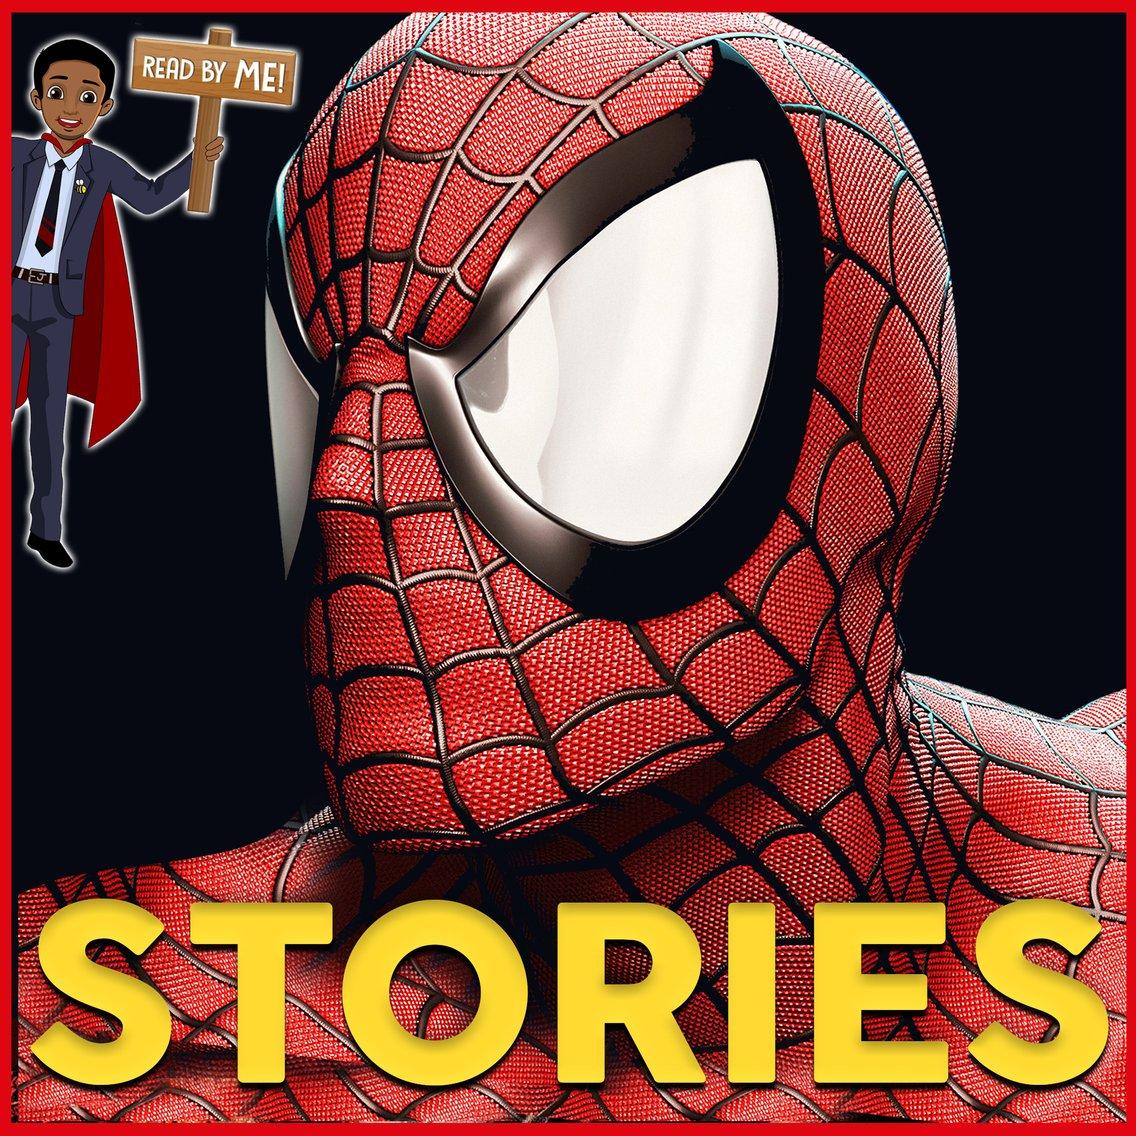 Sleep Stories - Superheros! - immagine di copertina